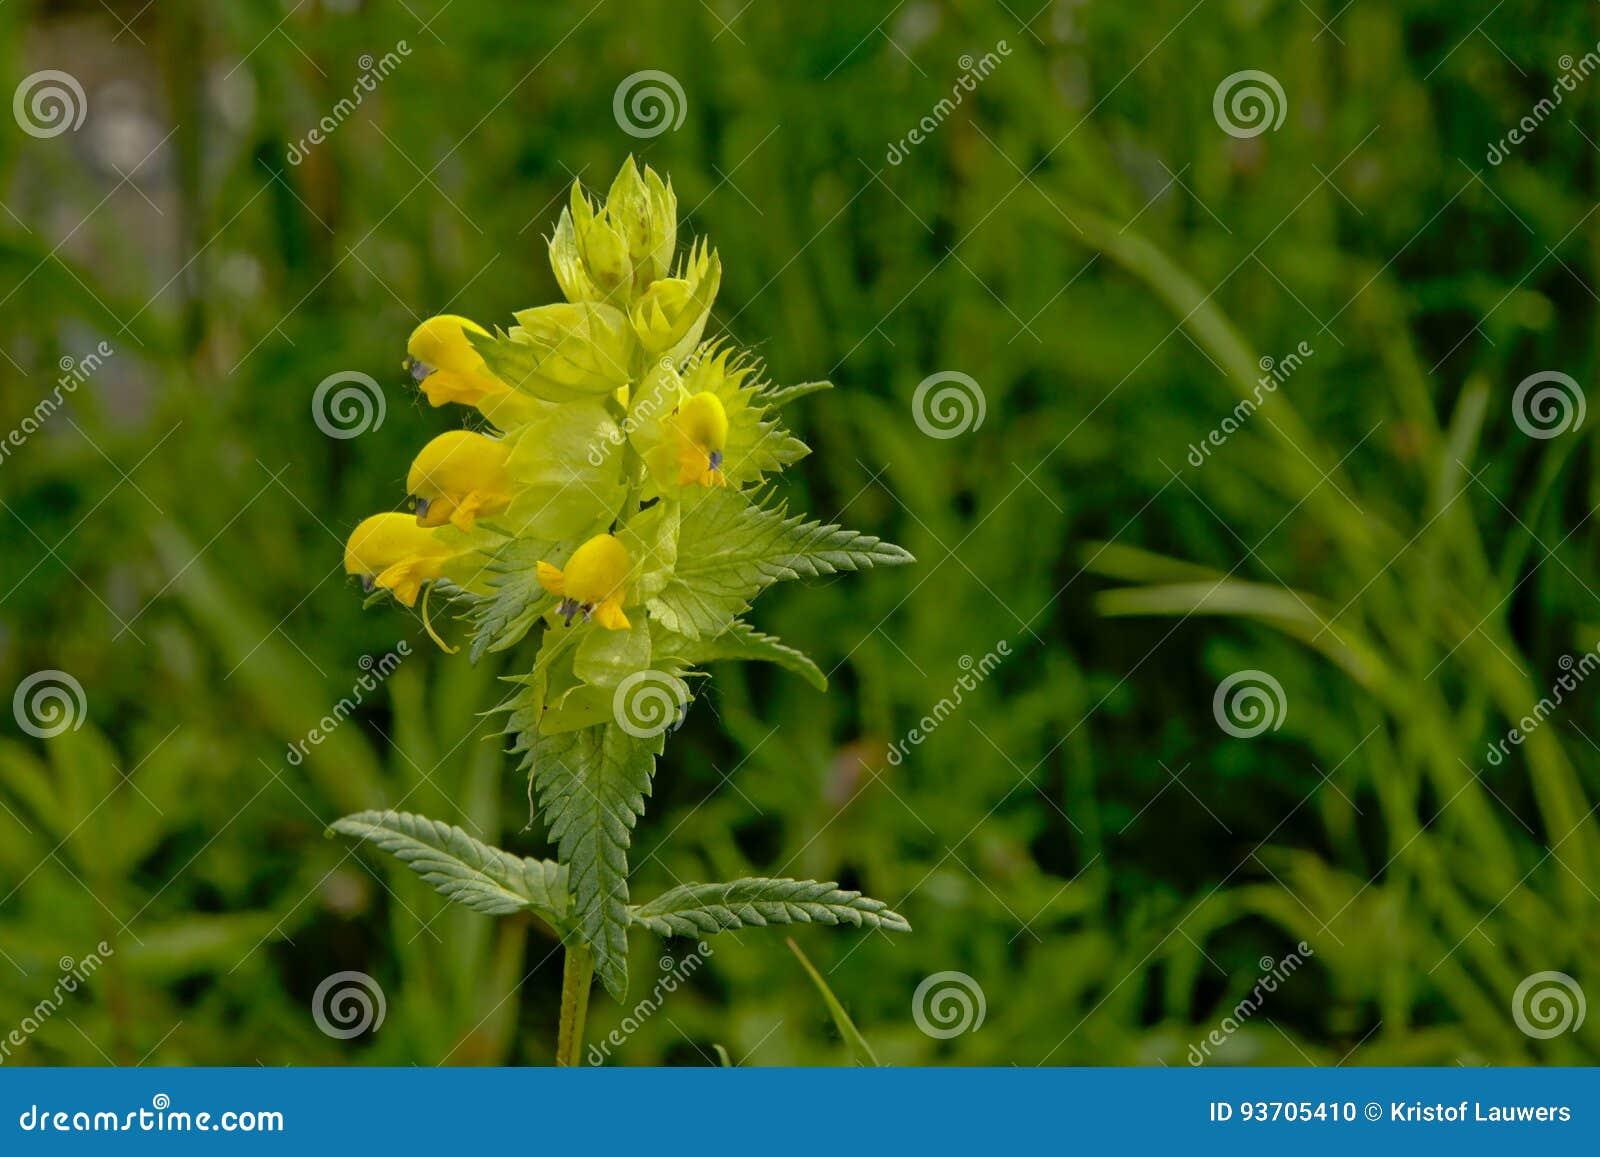 Greater Yellow Rattle Rhinanthus Angustifolius Stock Photo Image